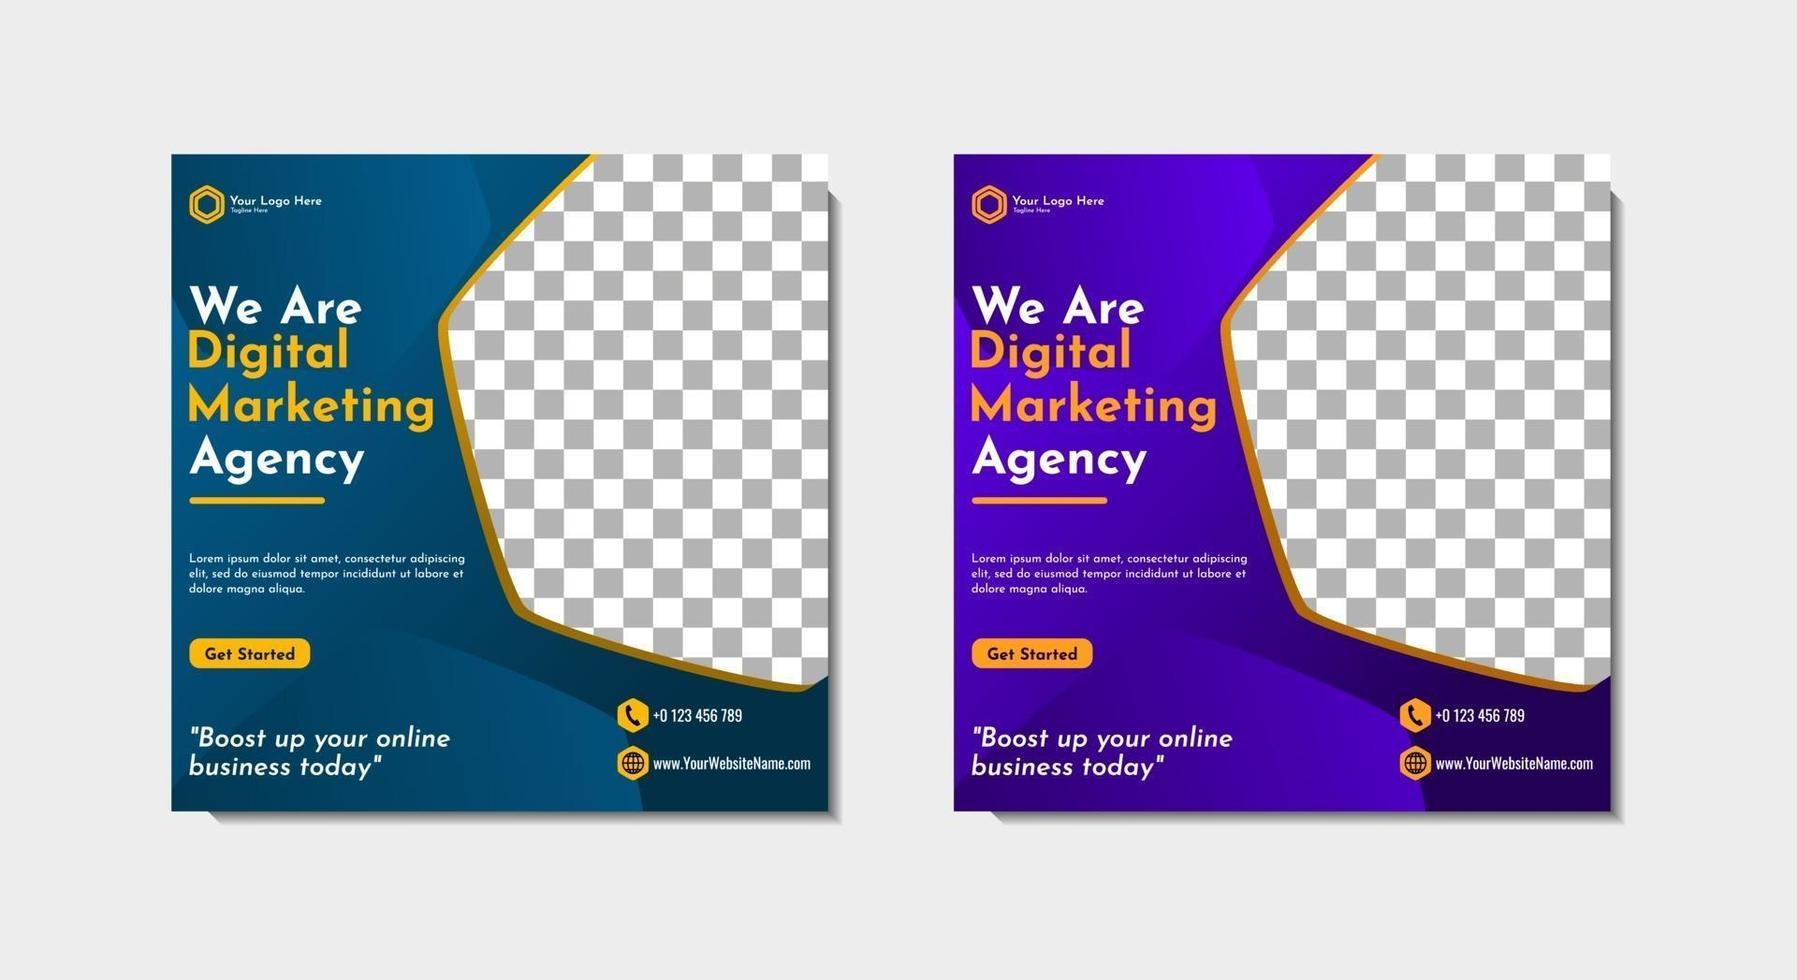 social media post template agenzia di affari digitali vettore